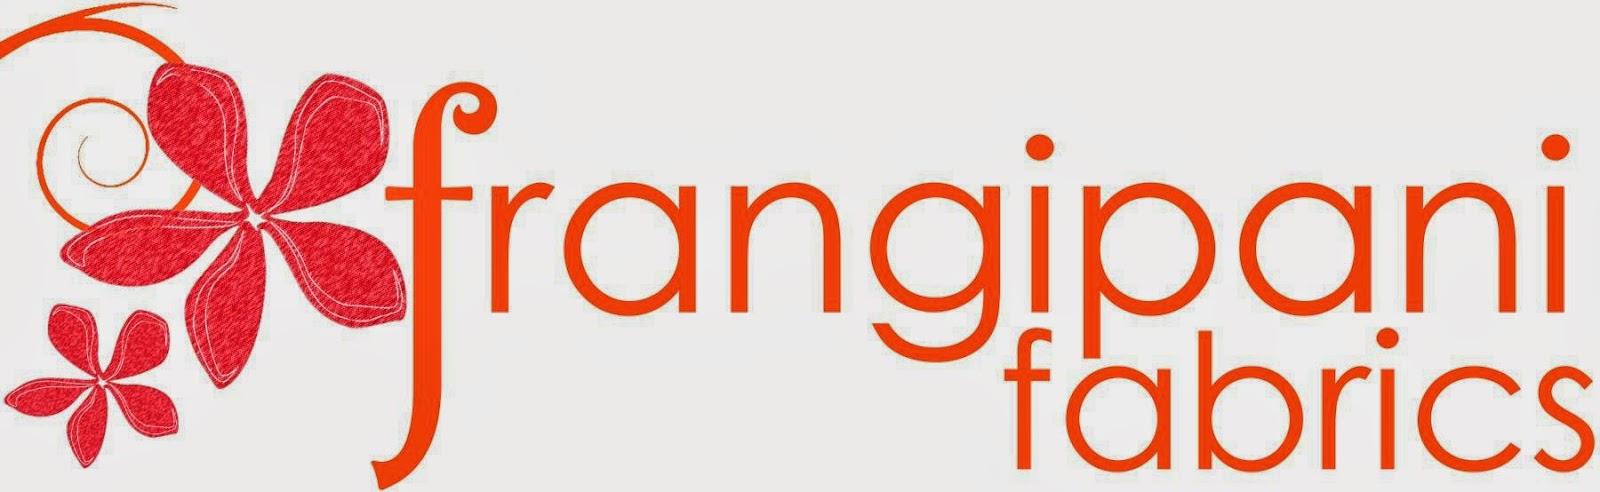 Frangipani Fabrics